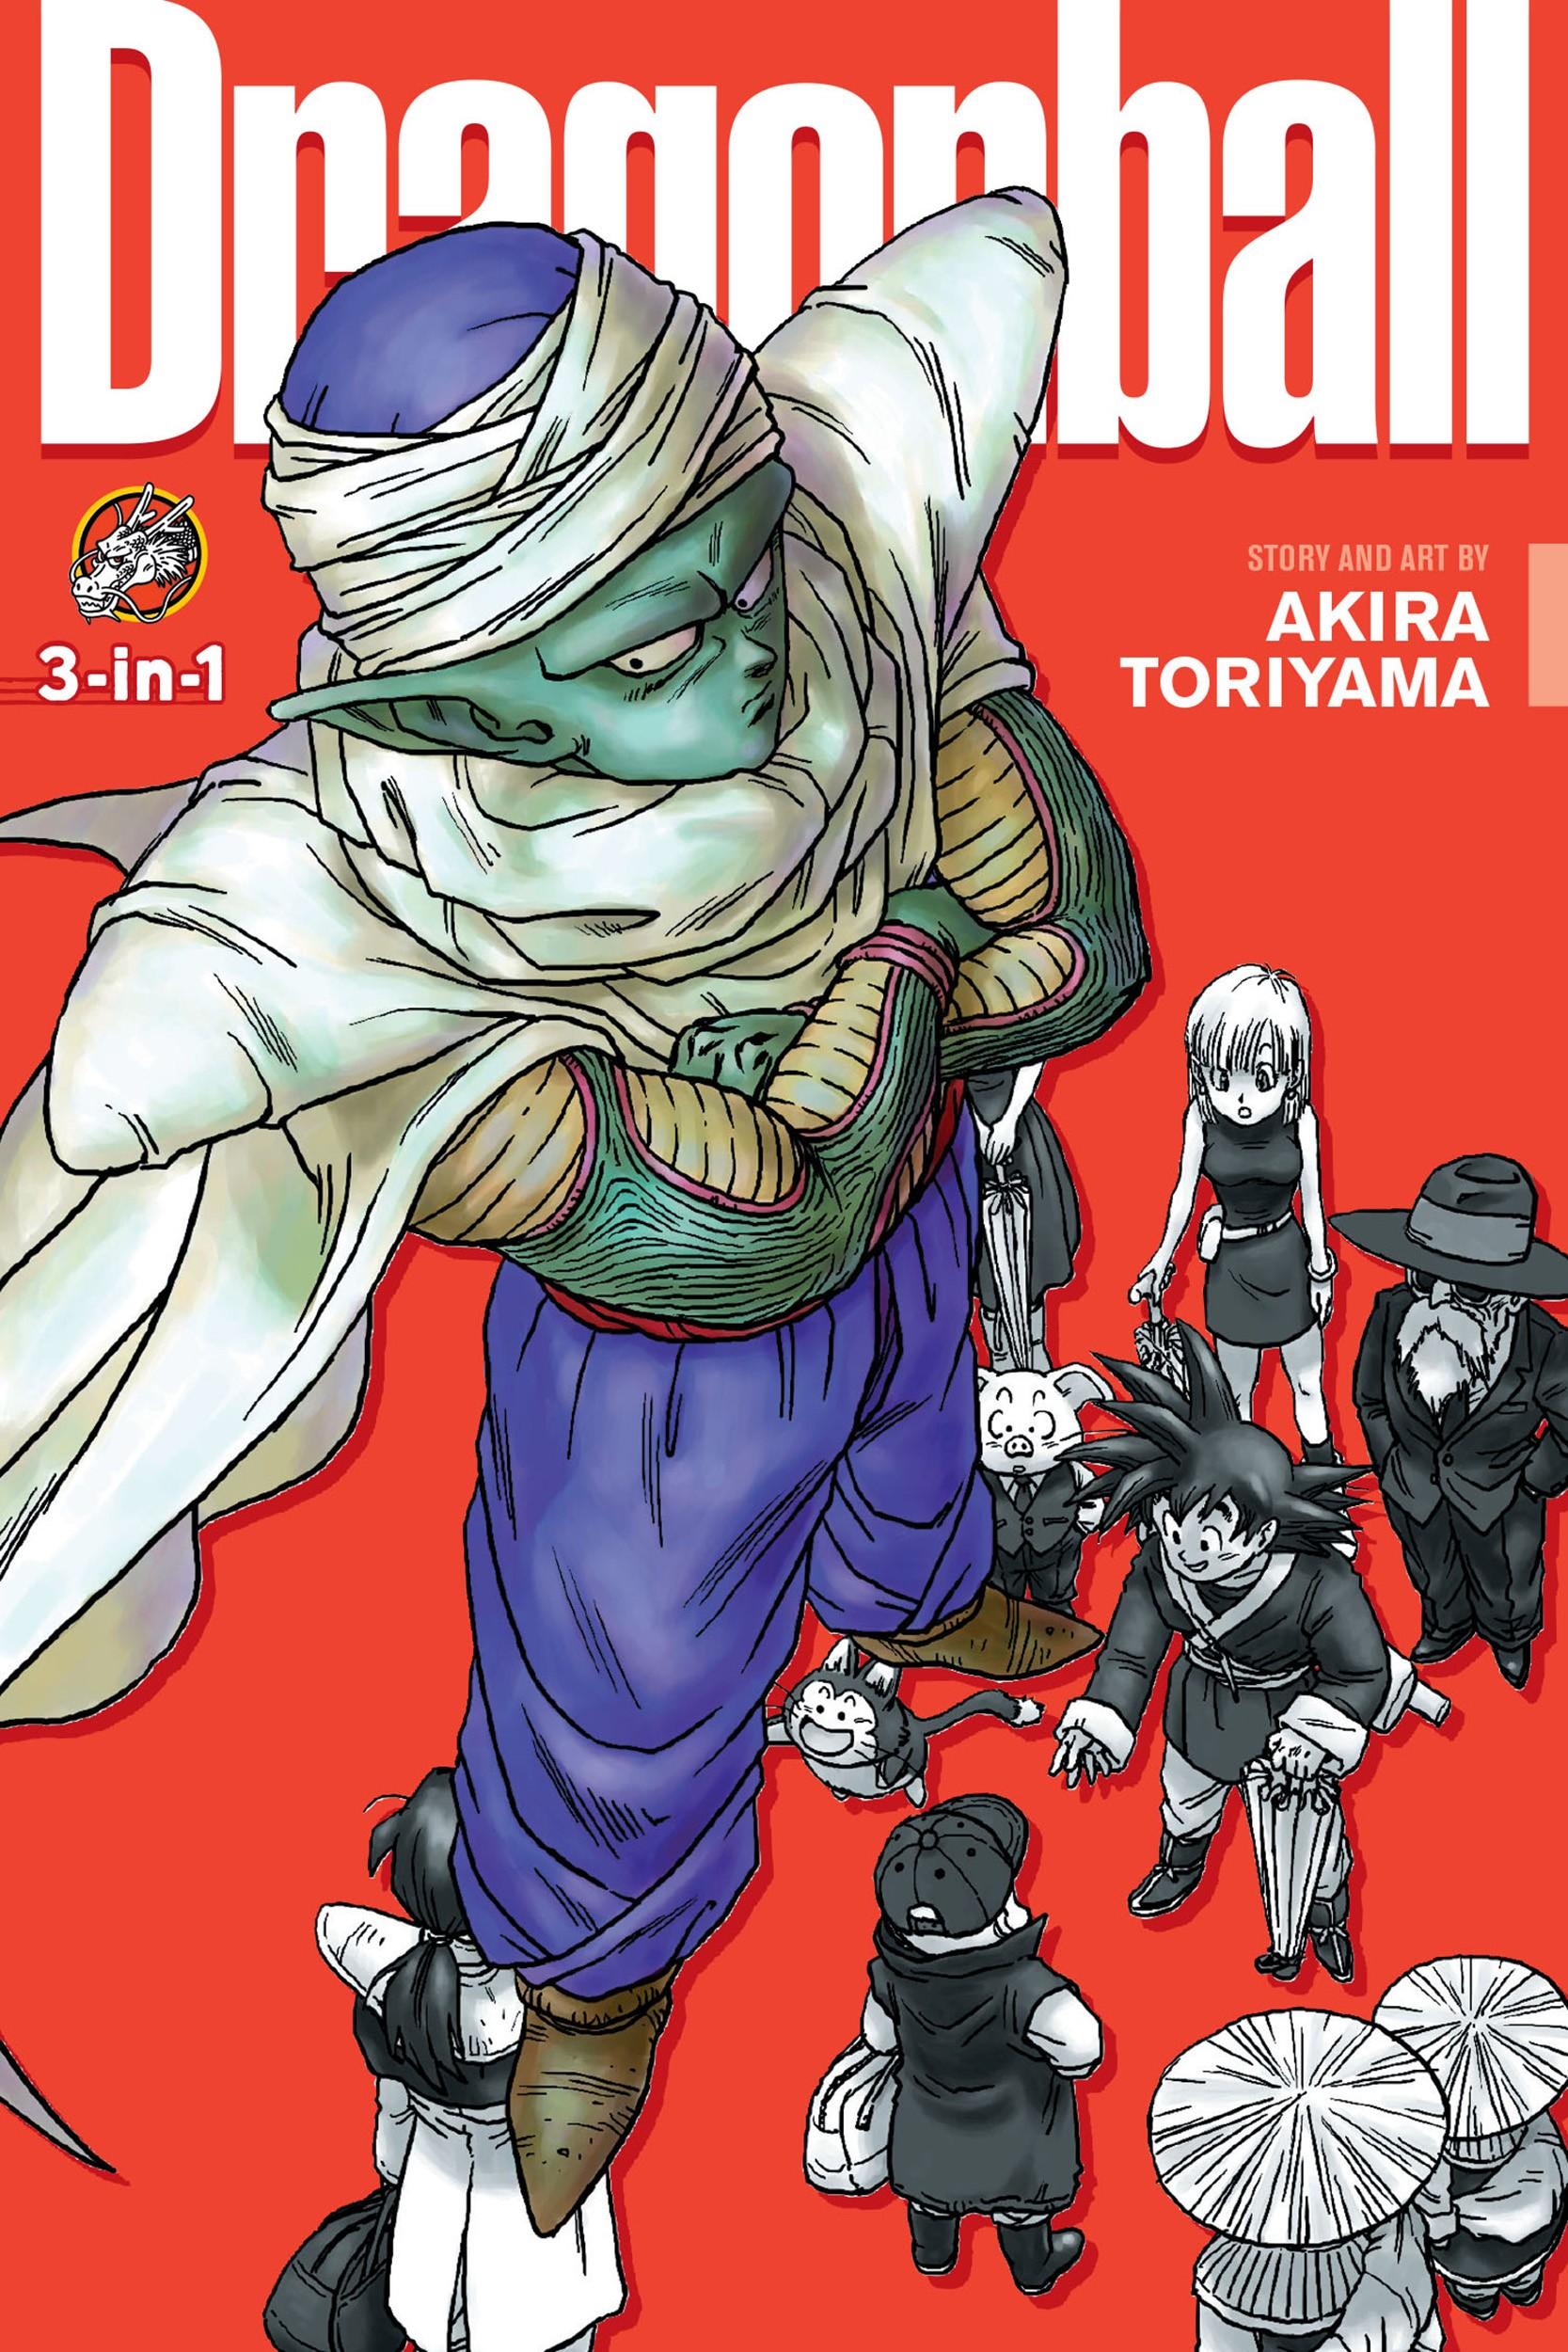 Dragon Ball (3-in-1 Edition), Vol. 05 by Akira Toriyama